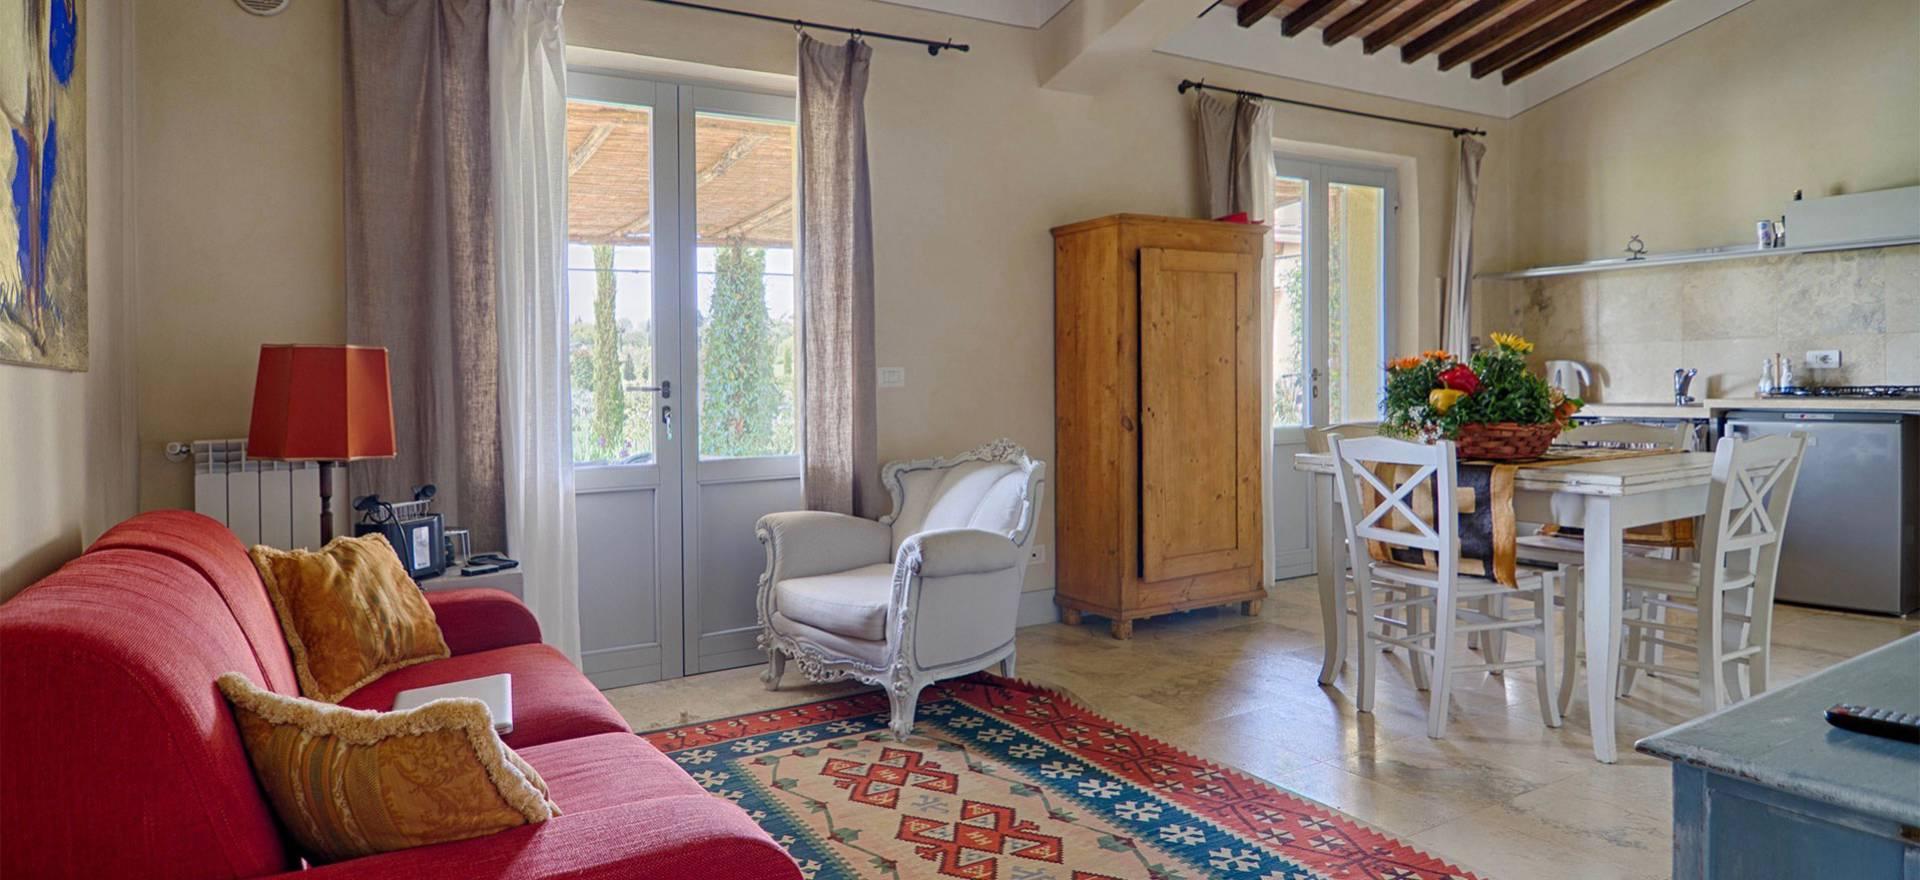 Agriturismo Toscana Agriturismo Siena, appartamenti di lusso e piscina